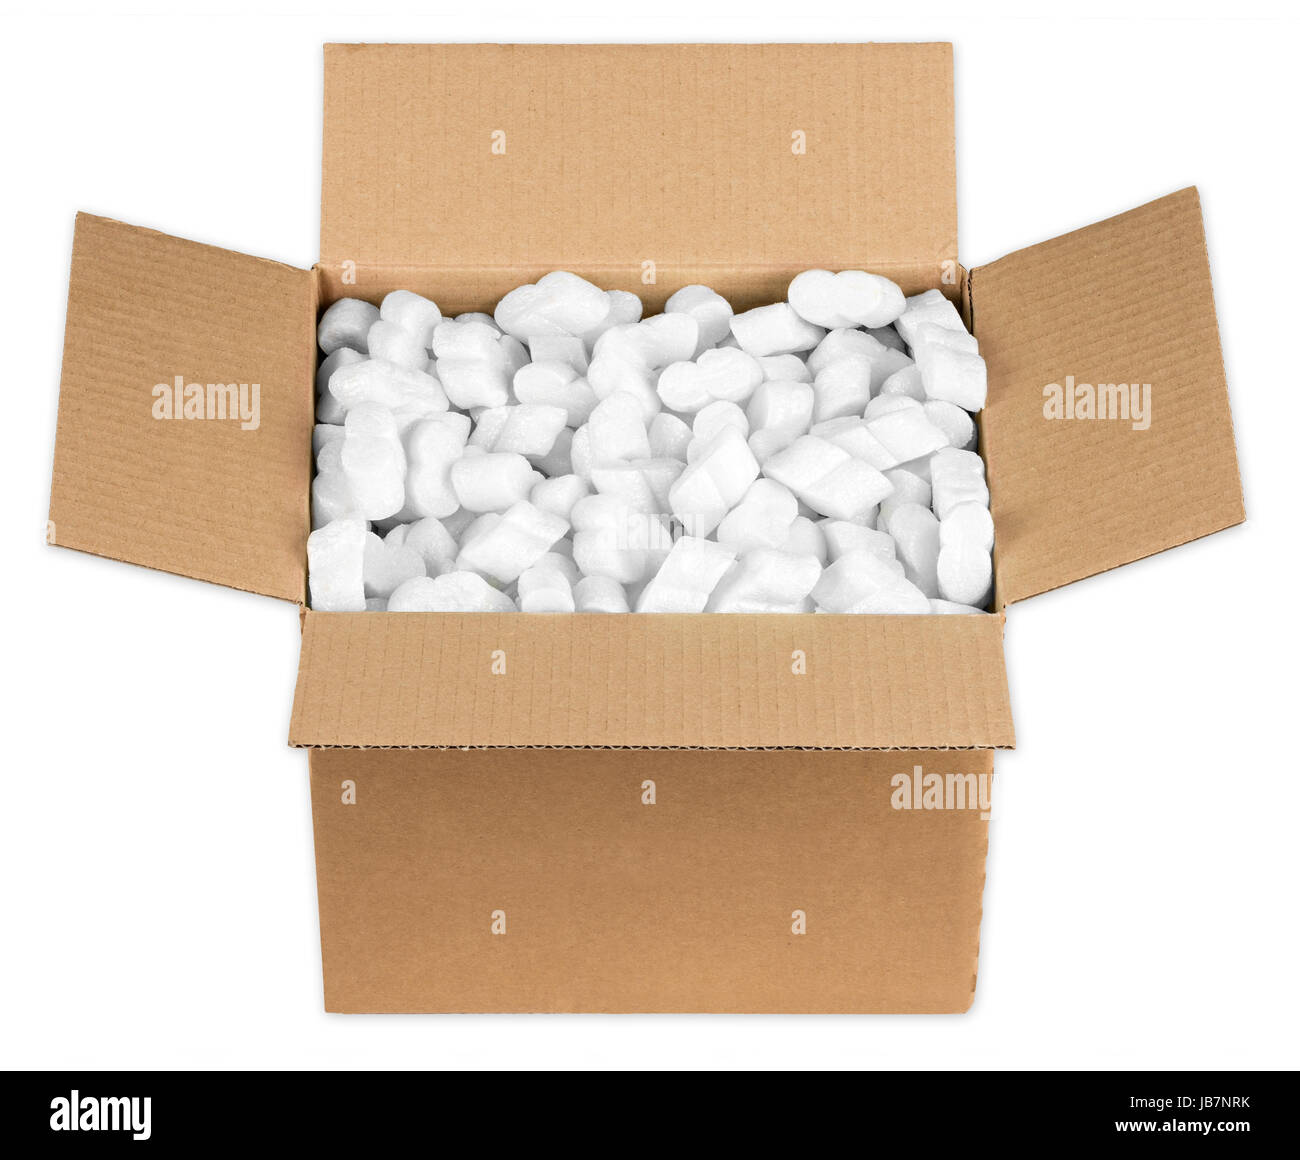 Offenes Paket mit styroporflocken Foto de stock